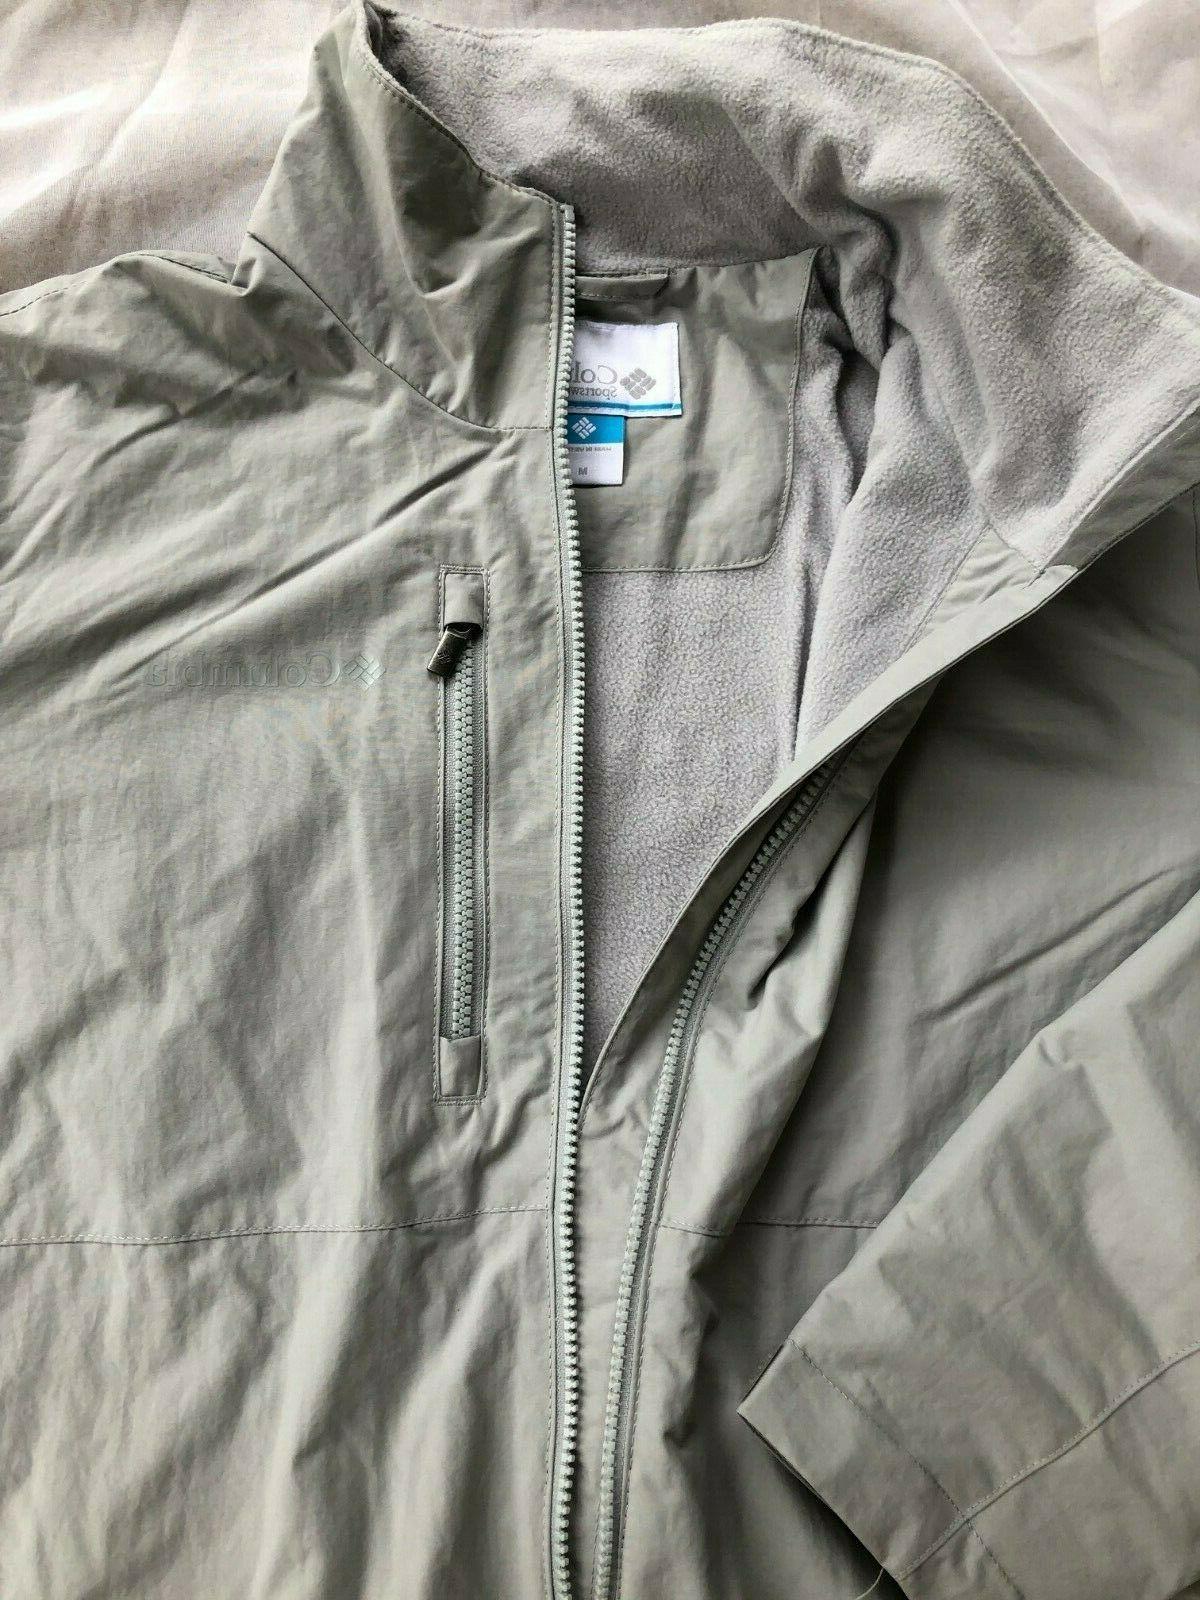 NWT Columbia Utilizer Jacket #1771571 Water Resistant